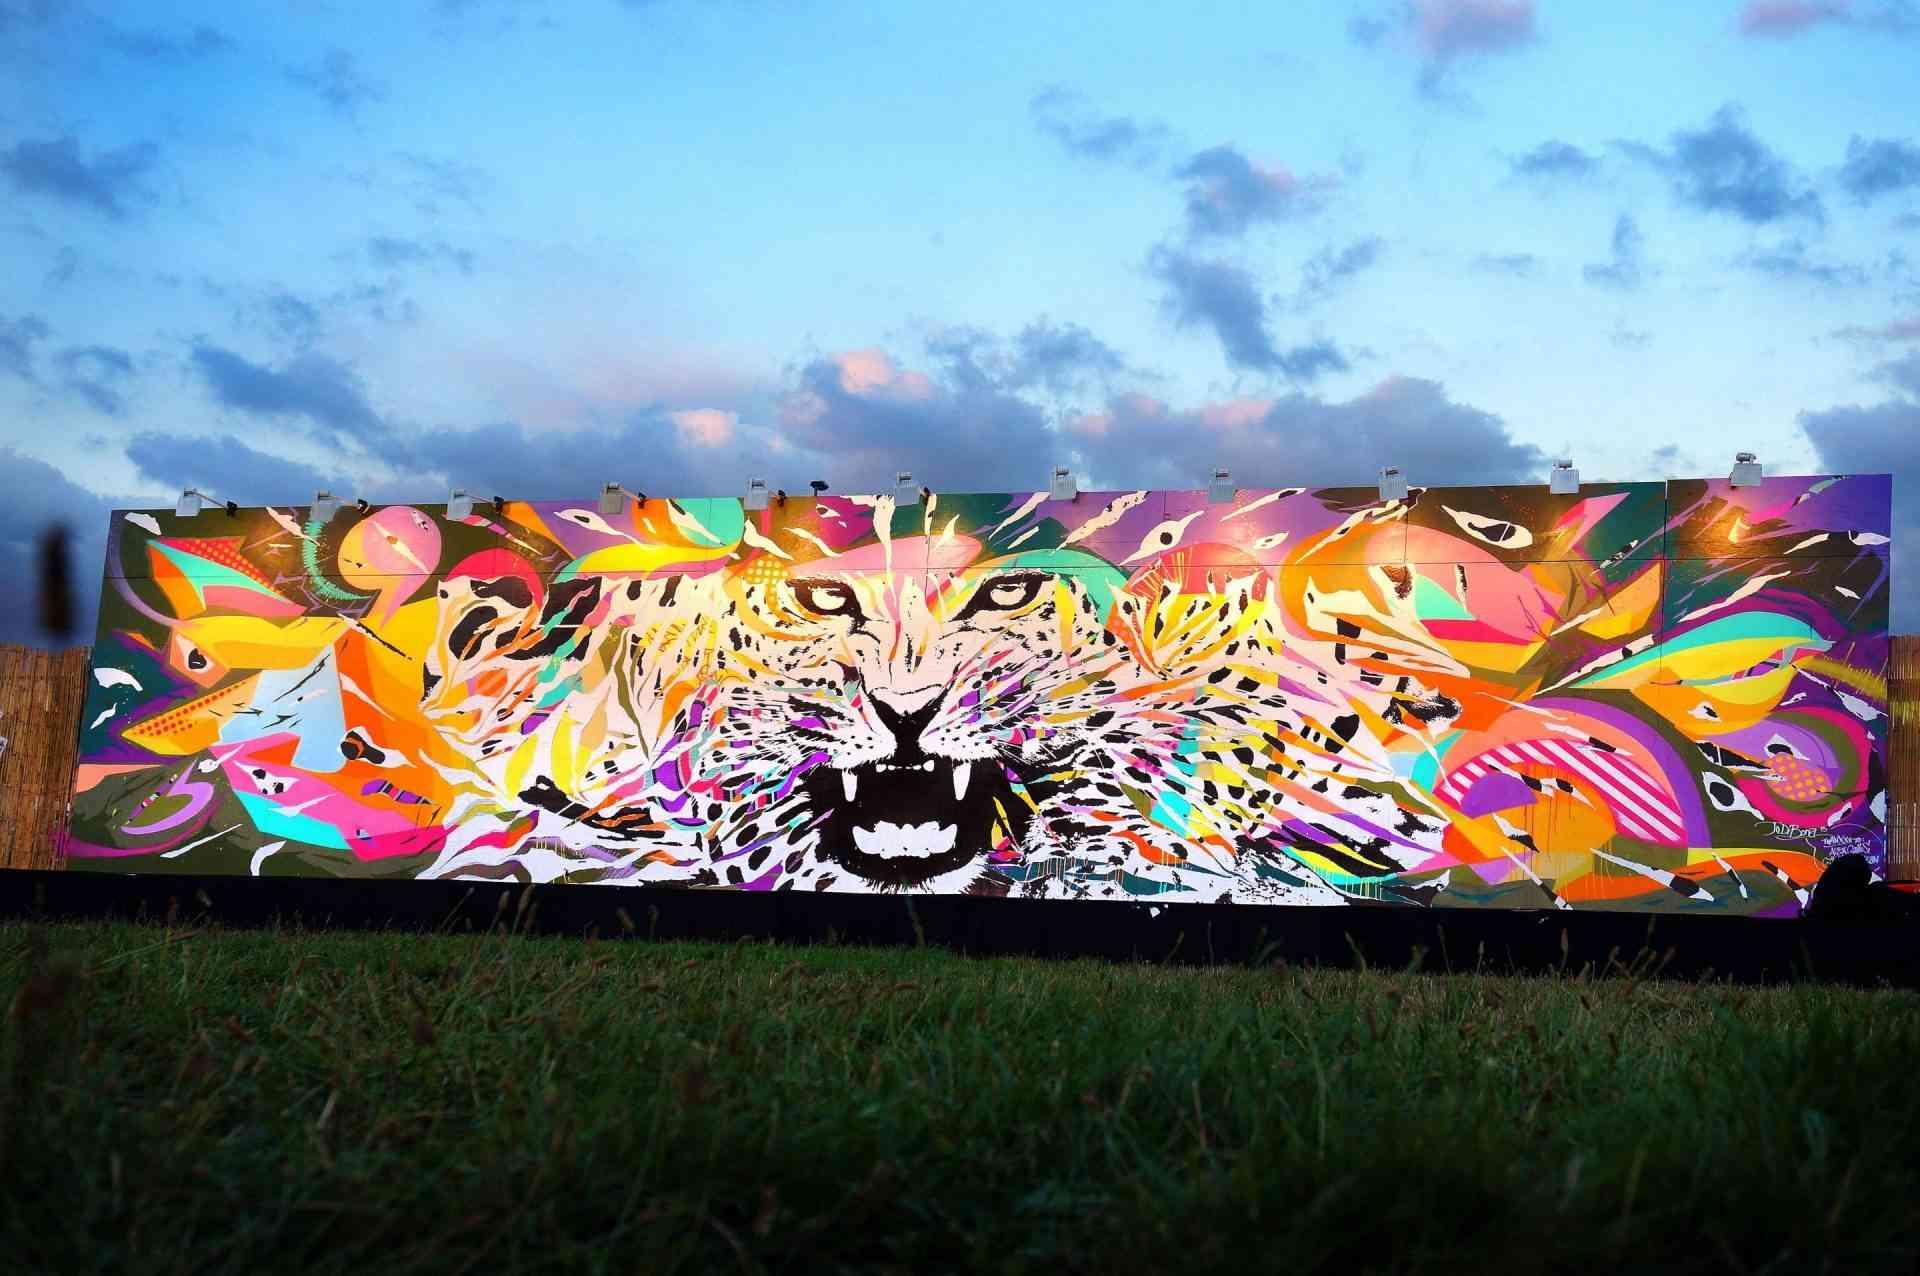 """LE M.U.R ROCK EN SEINE Saint-Cloud 2 by Jo Di Bona 2015"""